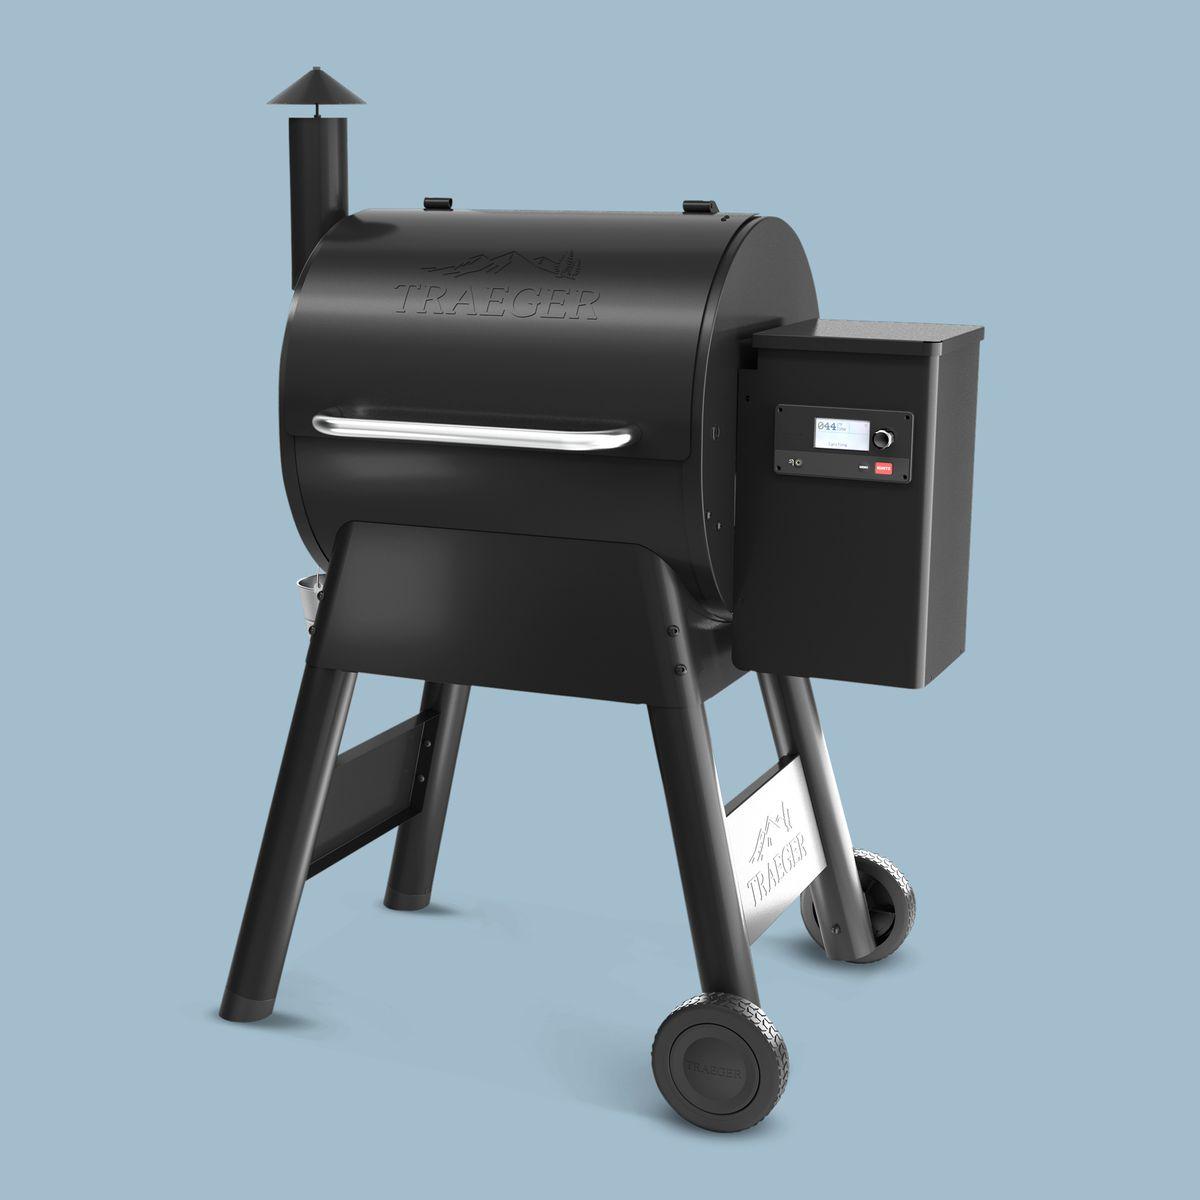 Summer 2021, Smart Home, pellet grill